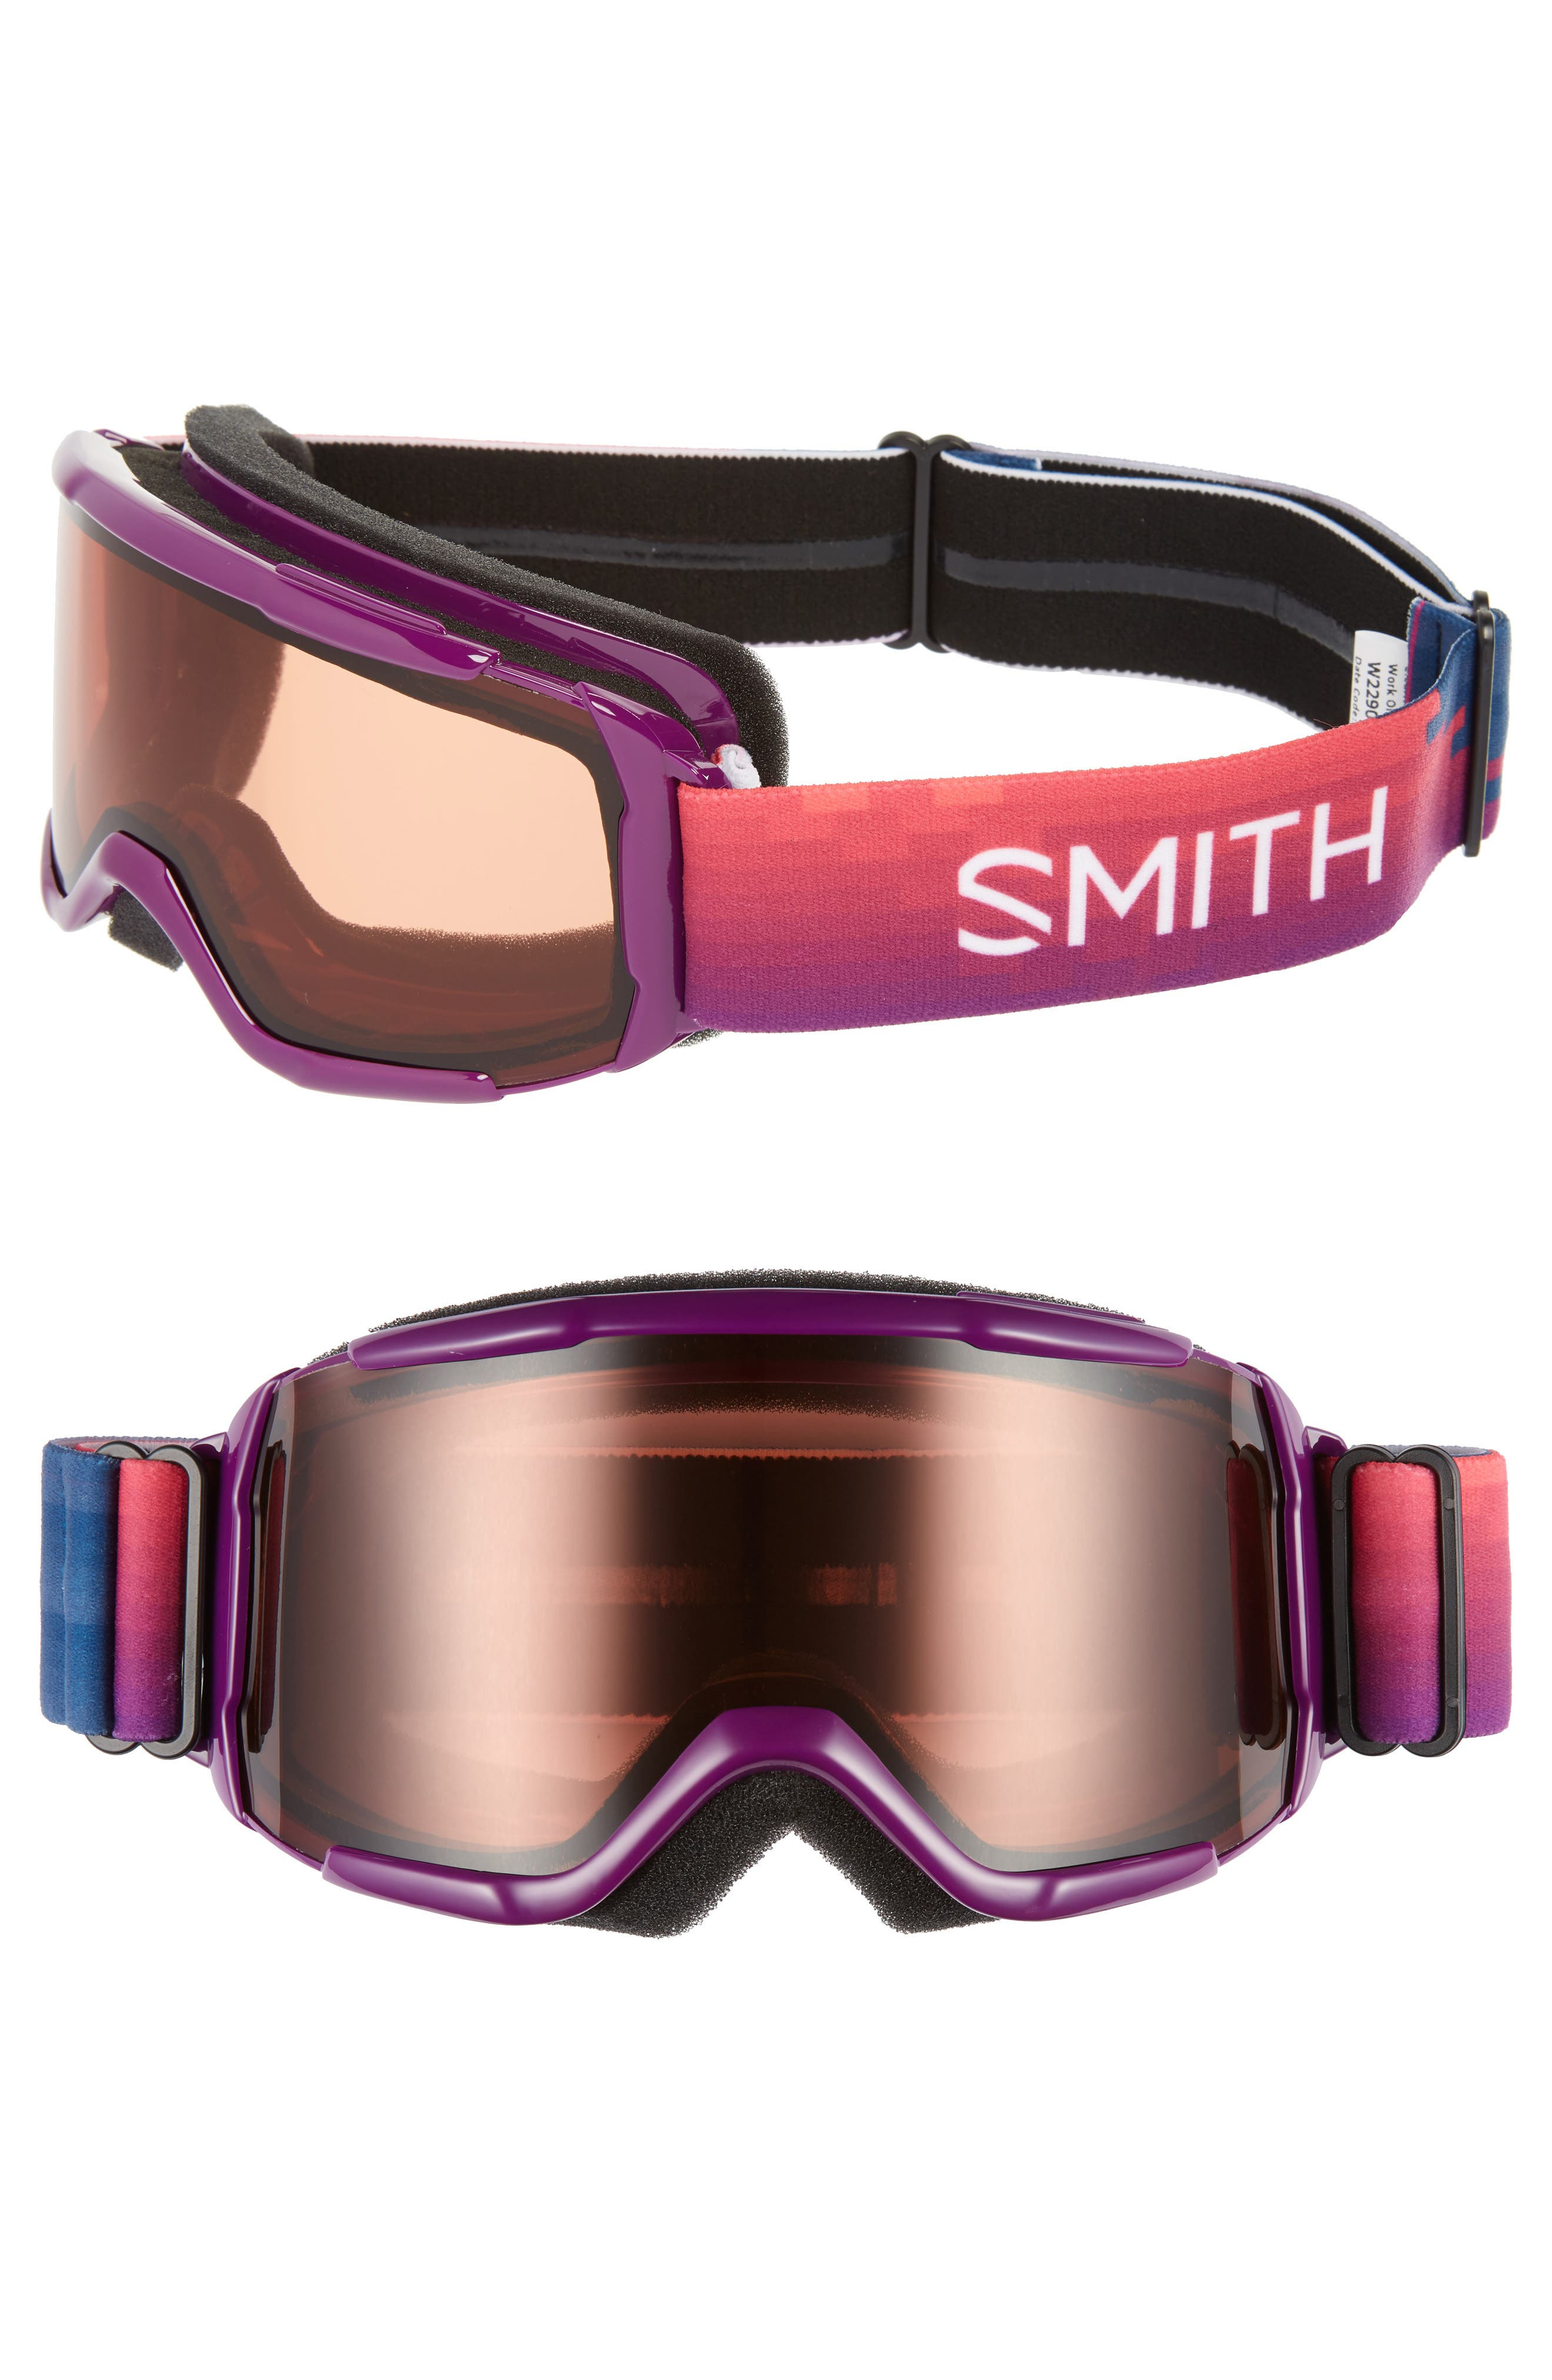 Daredevil 170mm Snow Goggles,                             Main thumbnail 1, color,                             MONARCH RESET